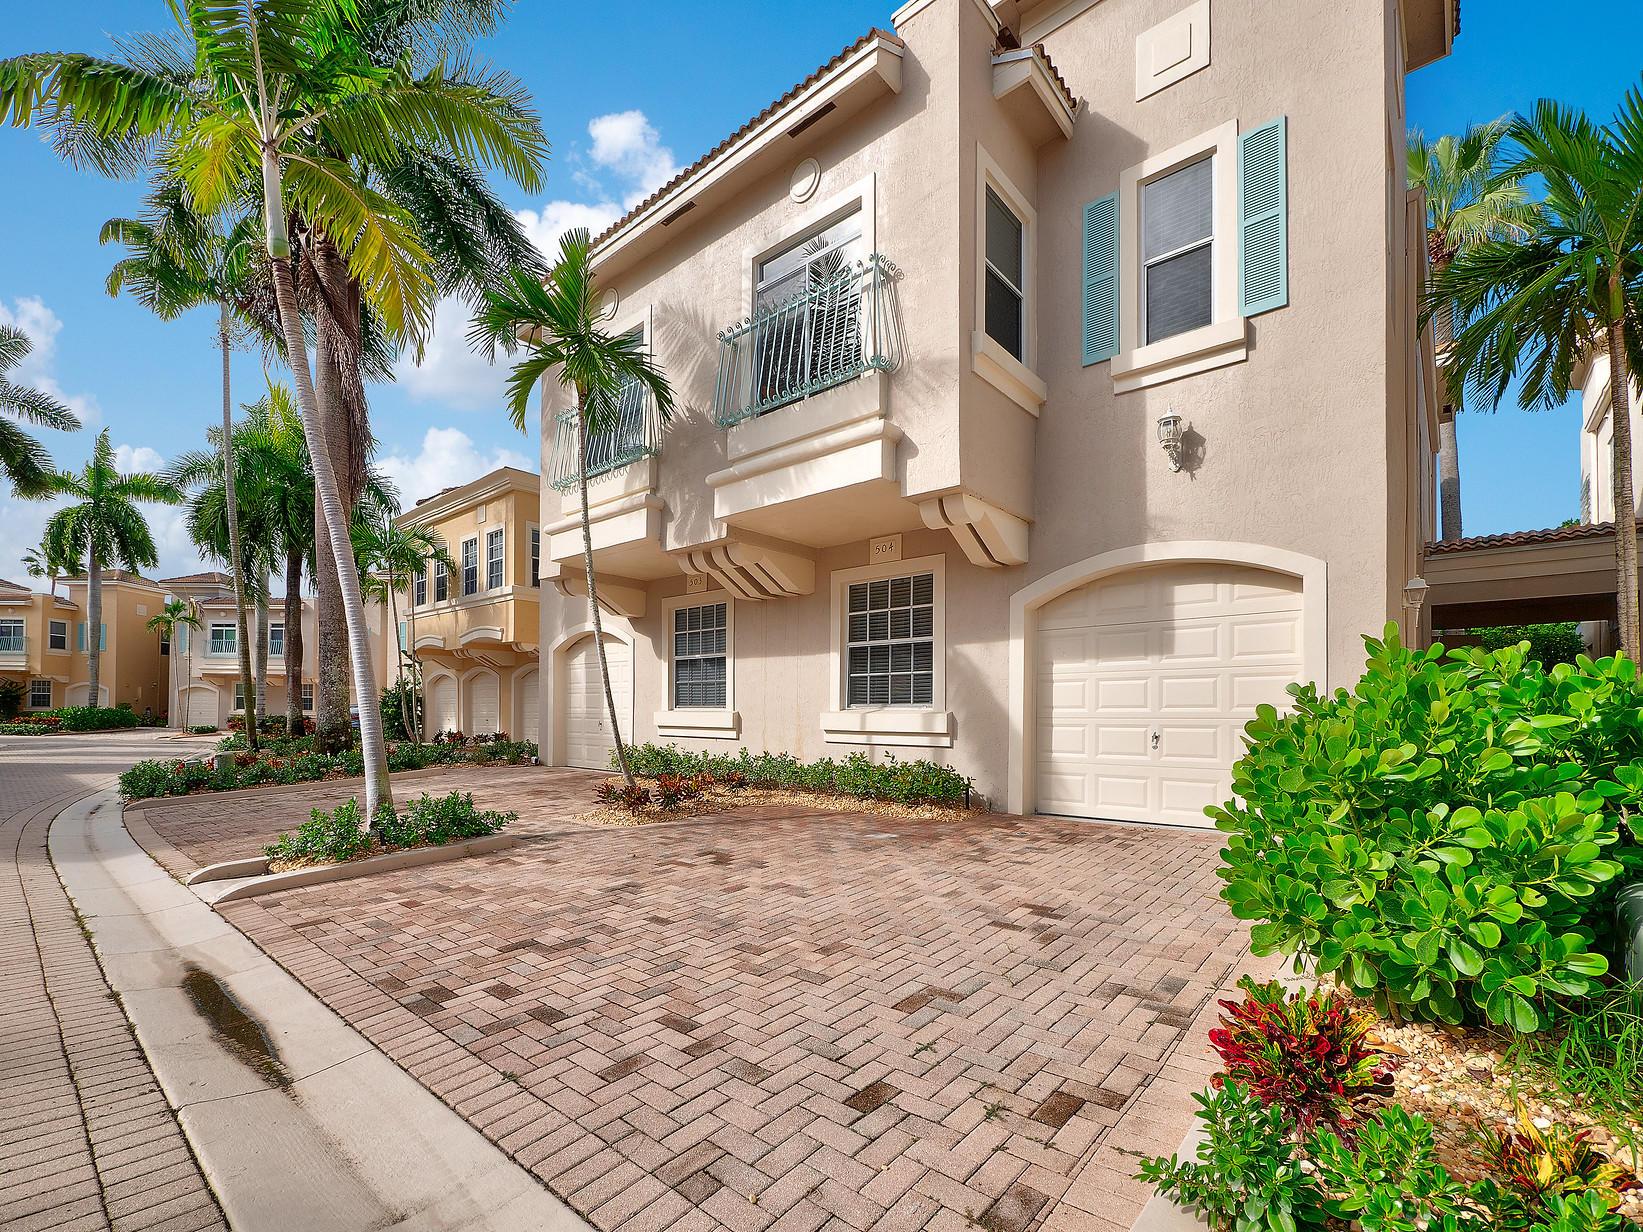 504 Resort Lane 504 Palm Beach Gardens, FL 33418